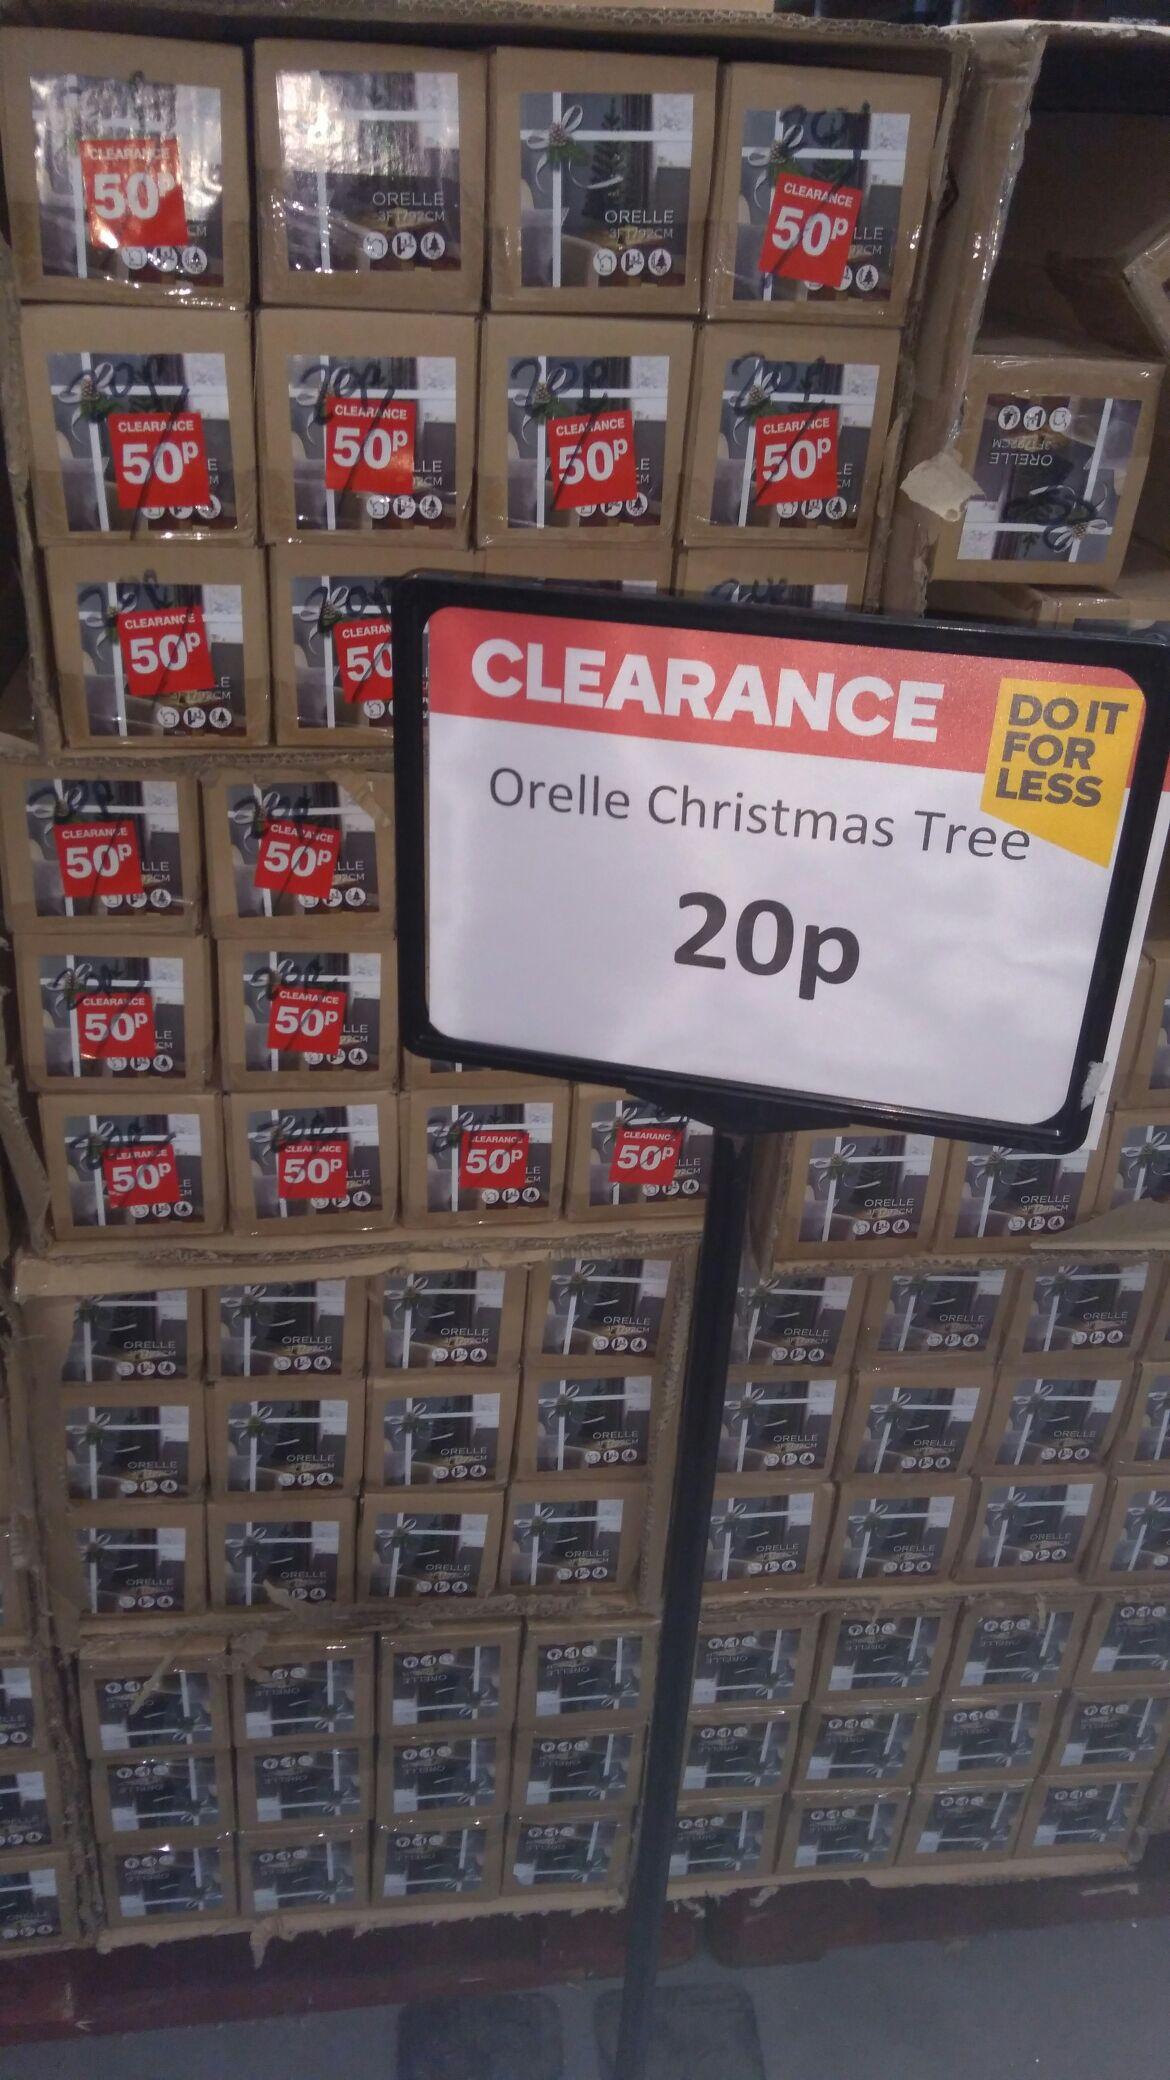 3ft Orelle Christmas Tree 20p in-store B&Q